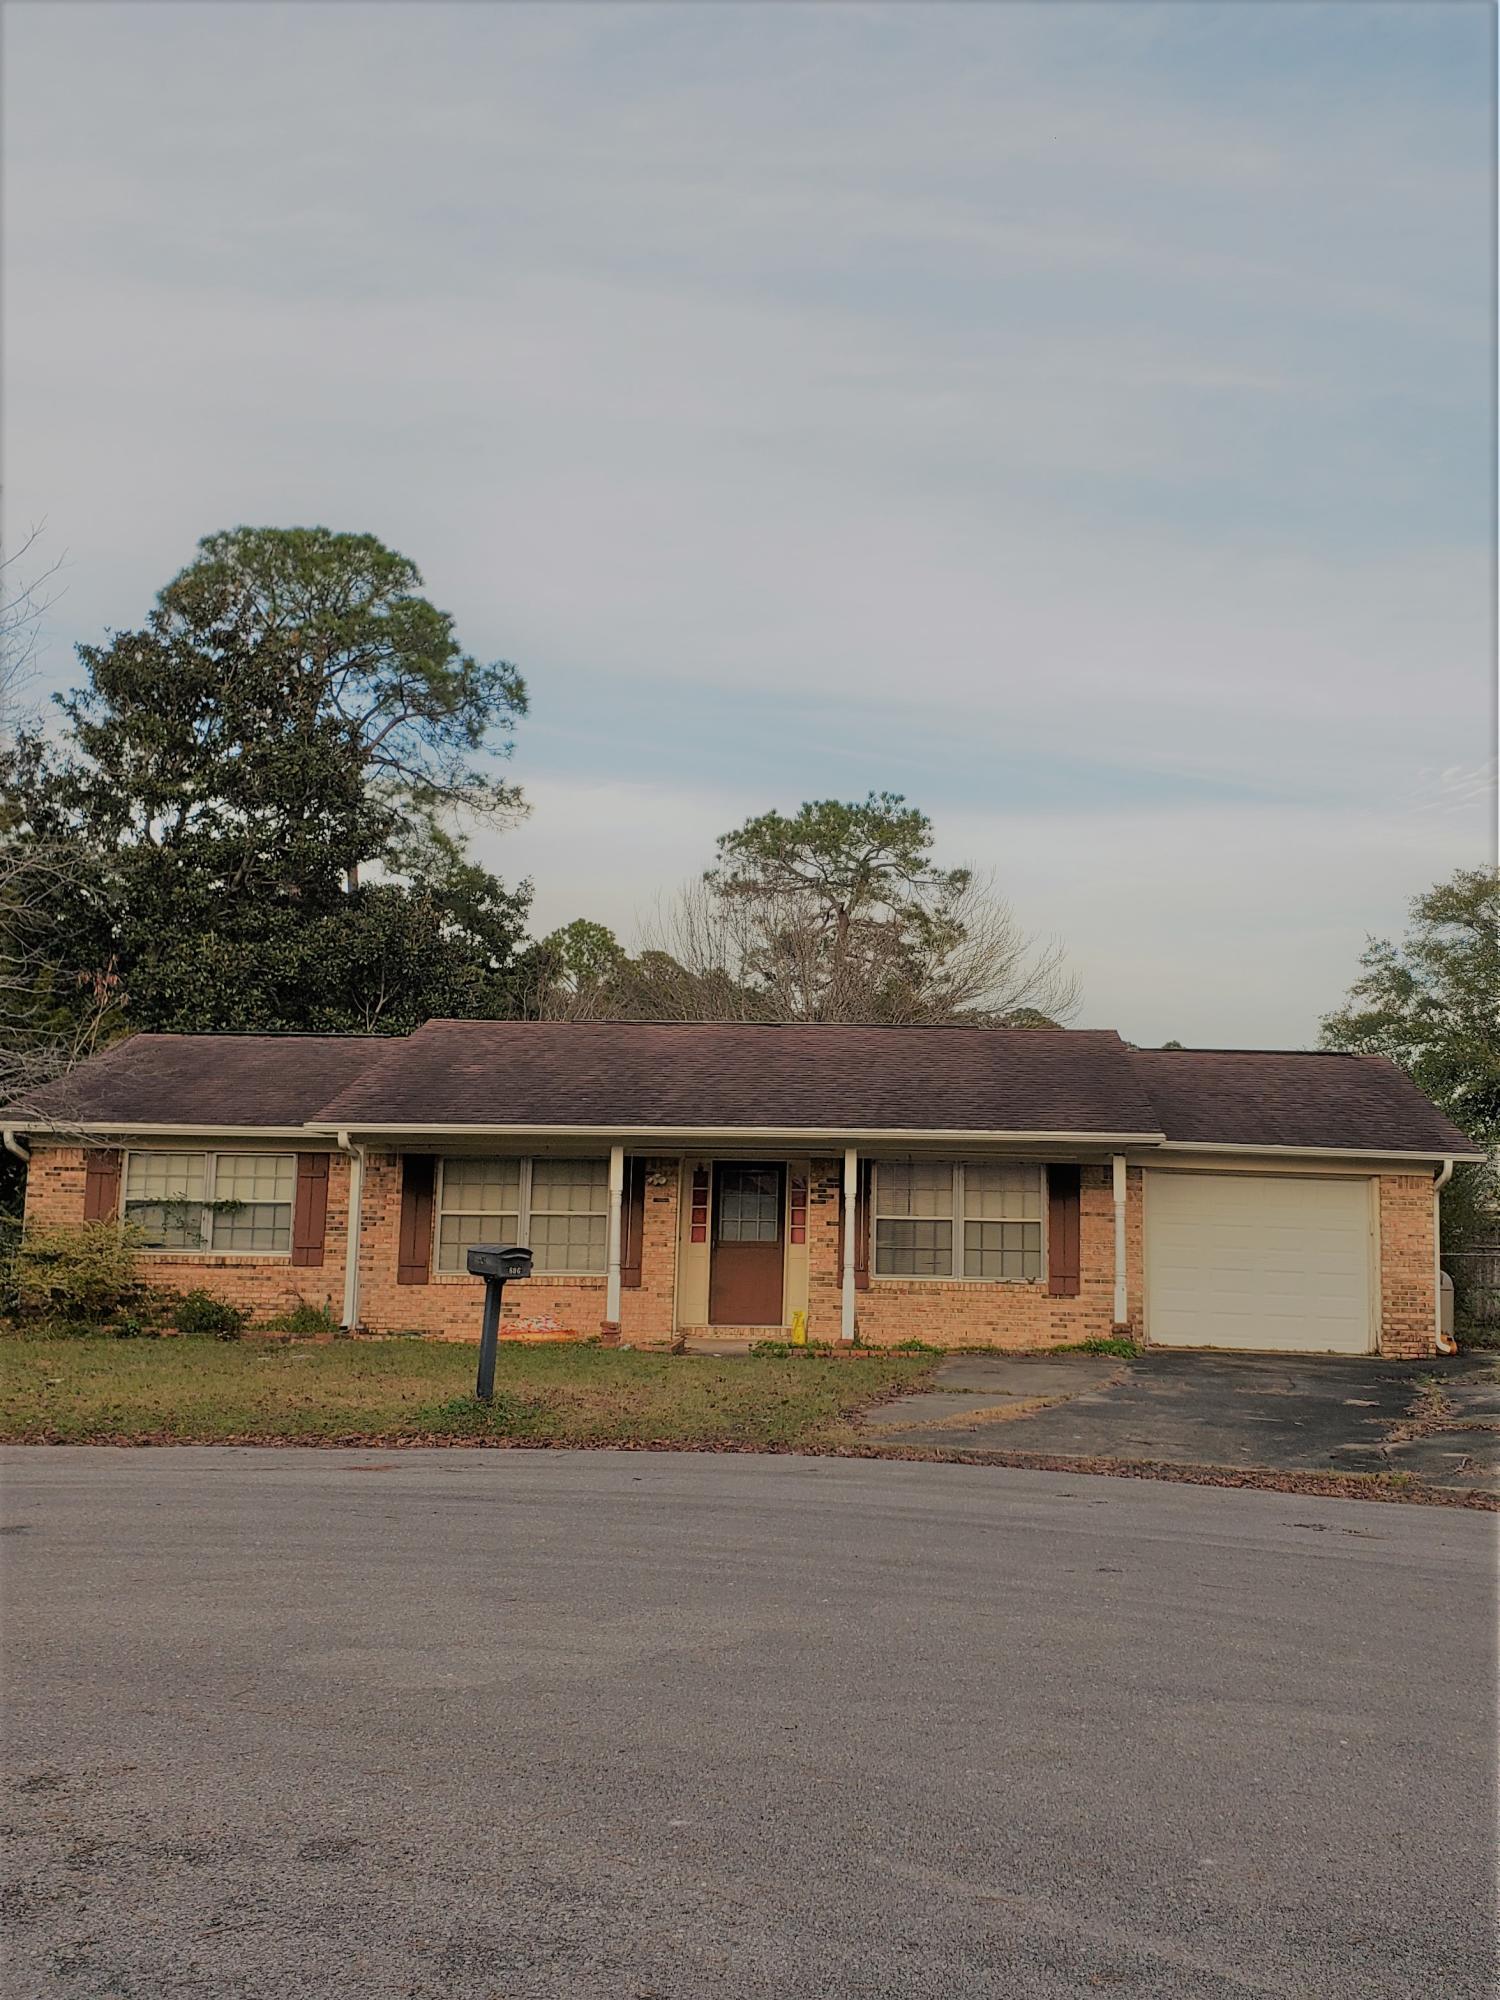 Photo of home for sale at 806 Surf, Niceville FL